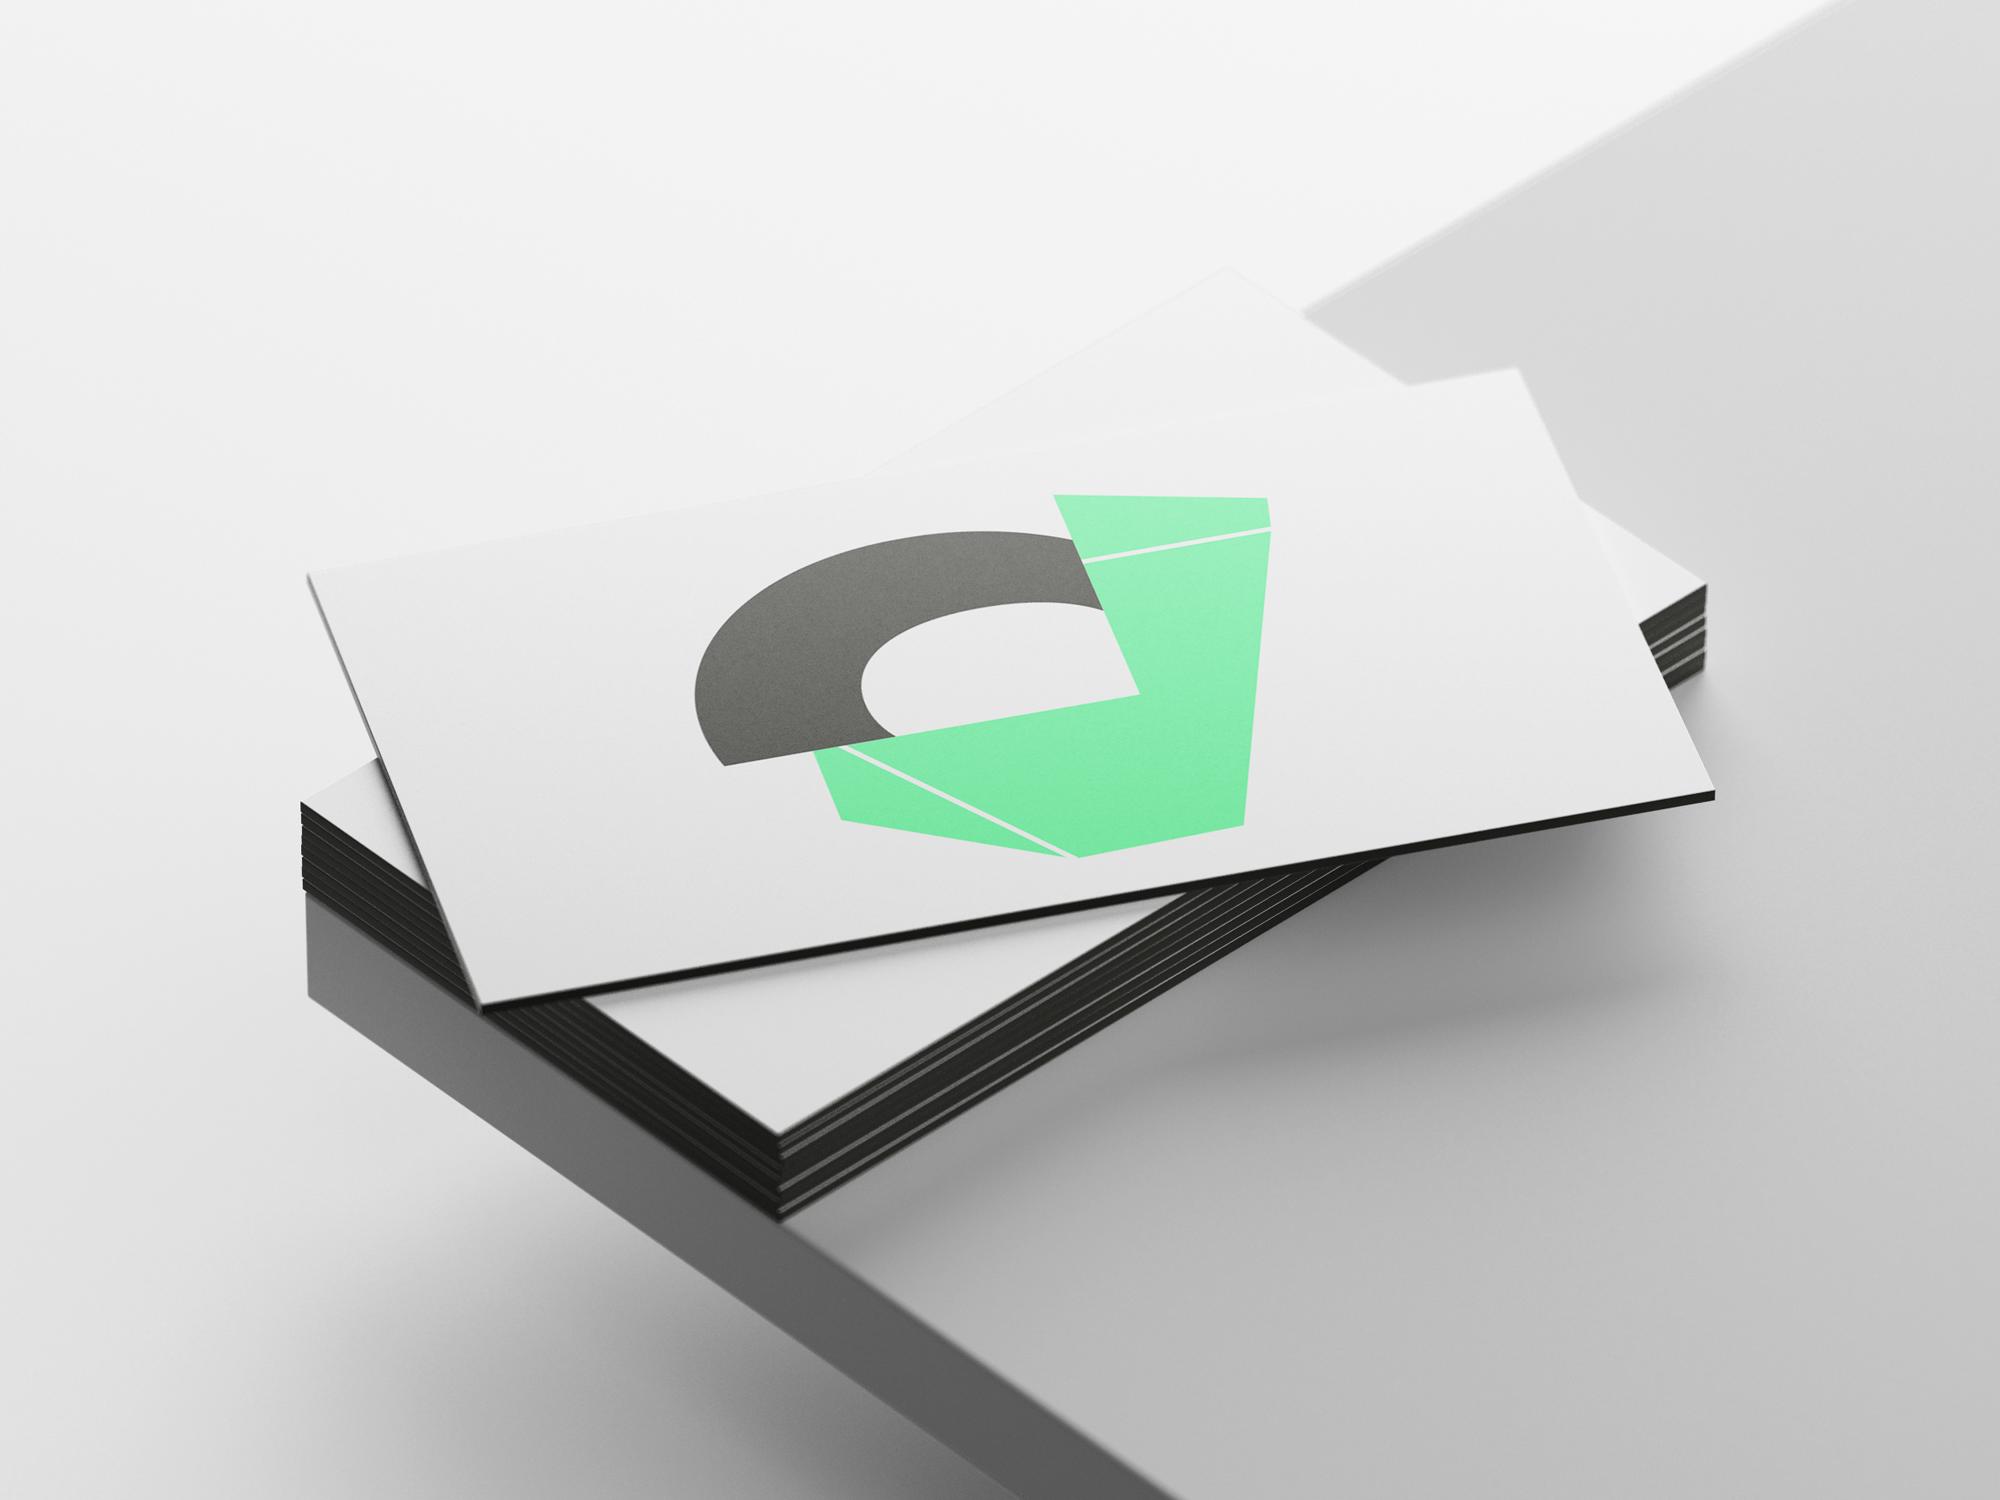 avirto-Business_Card_Mockup_3-green-black